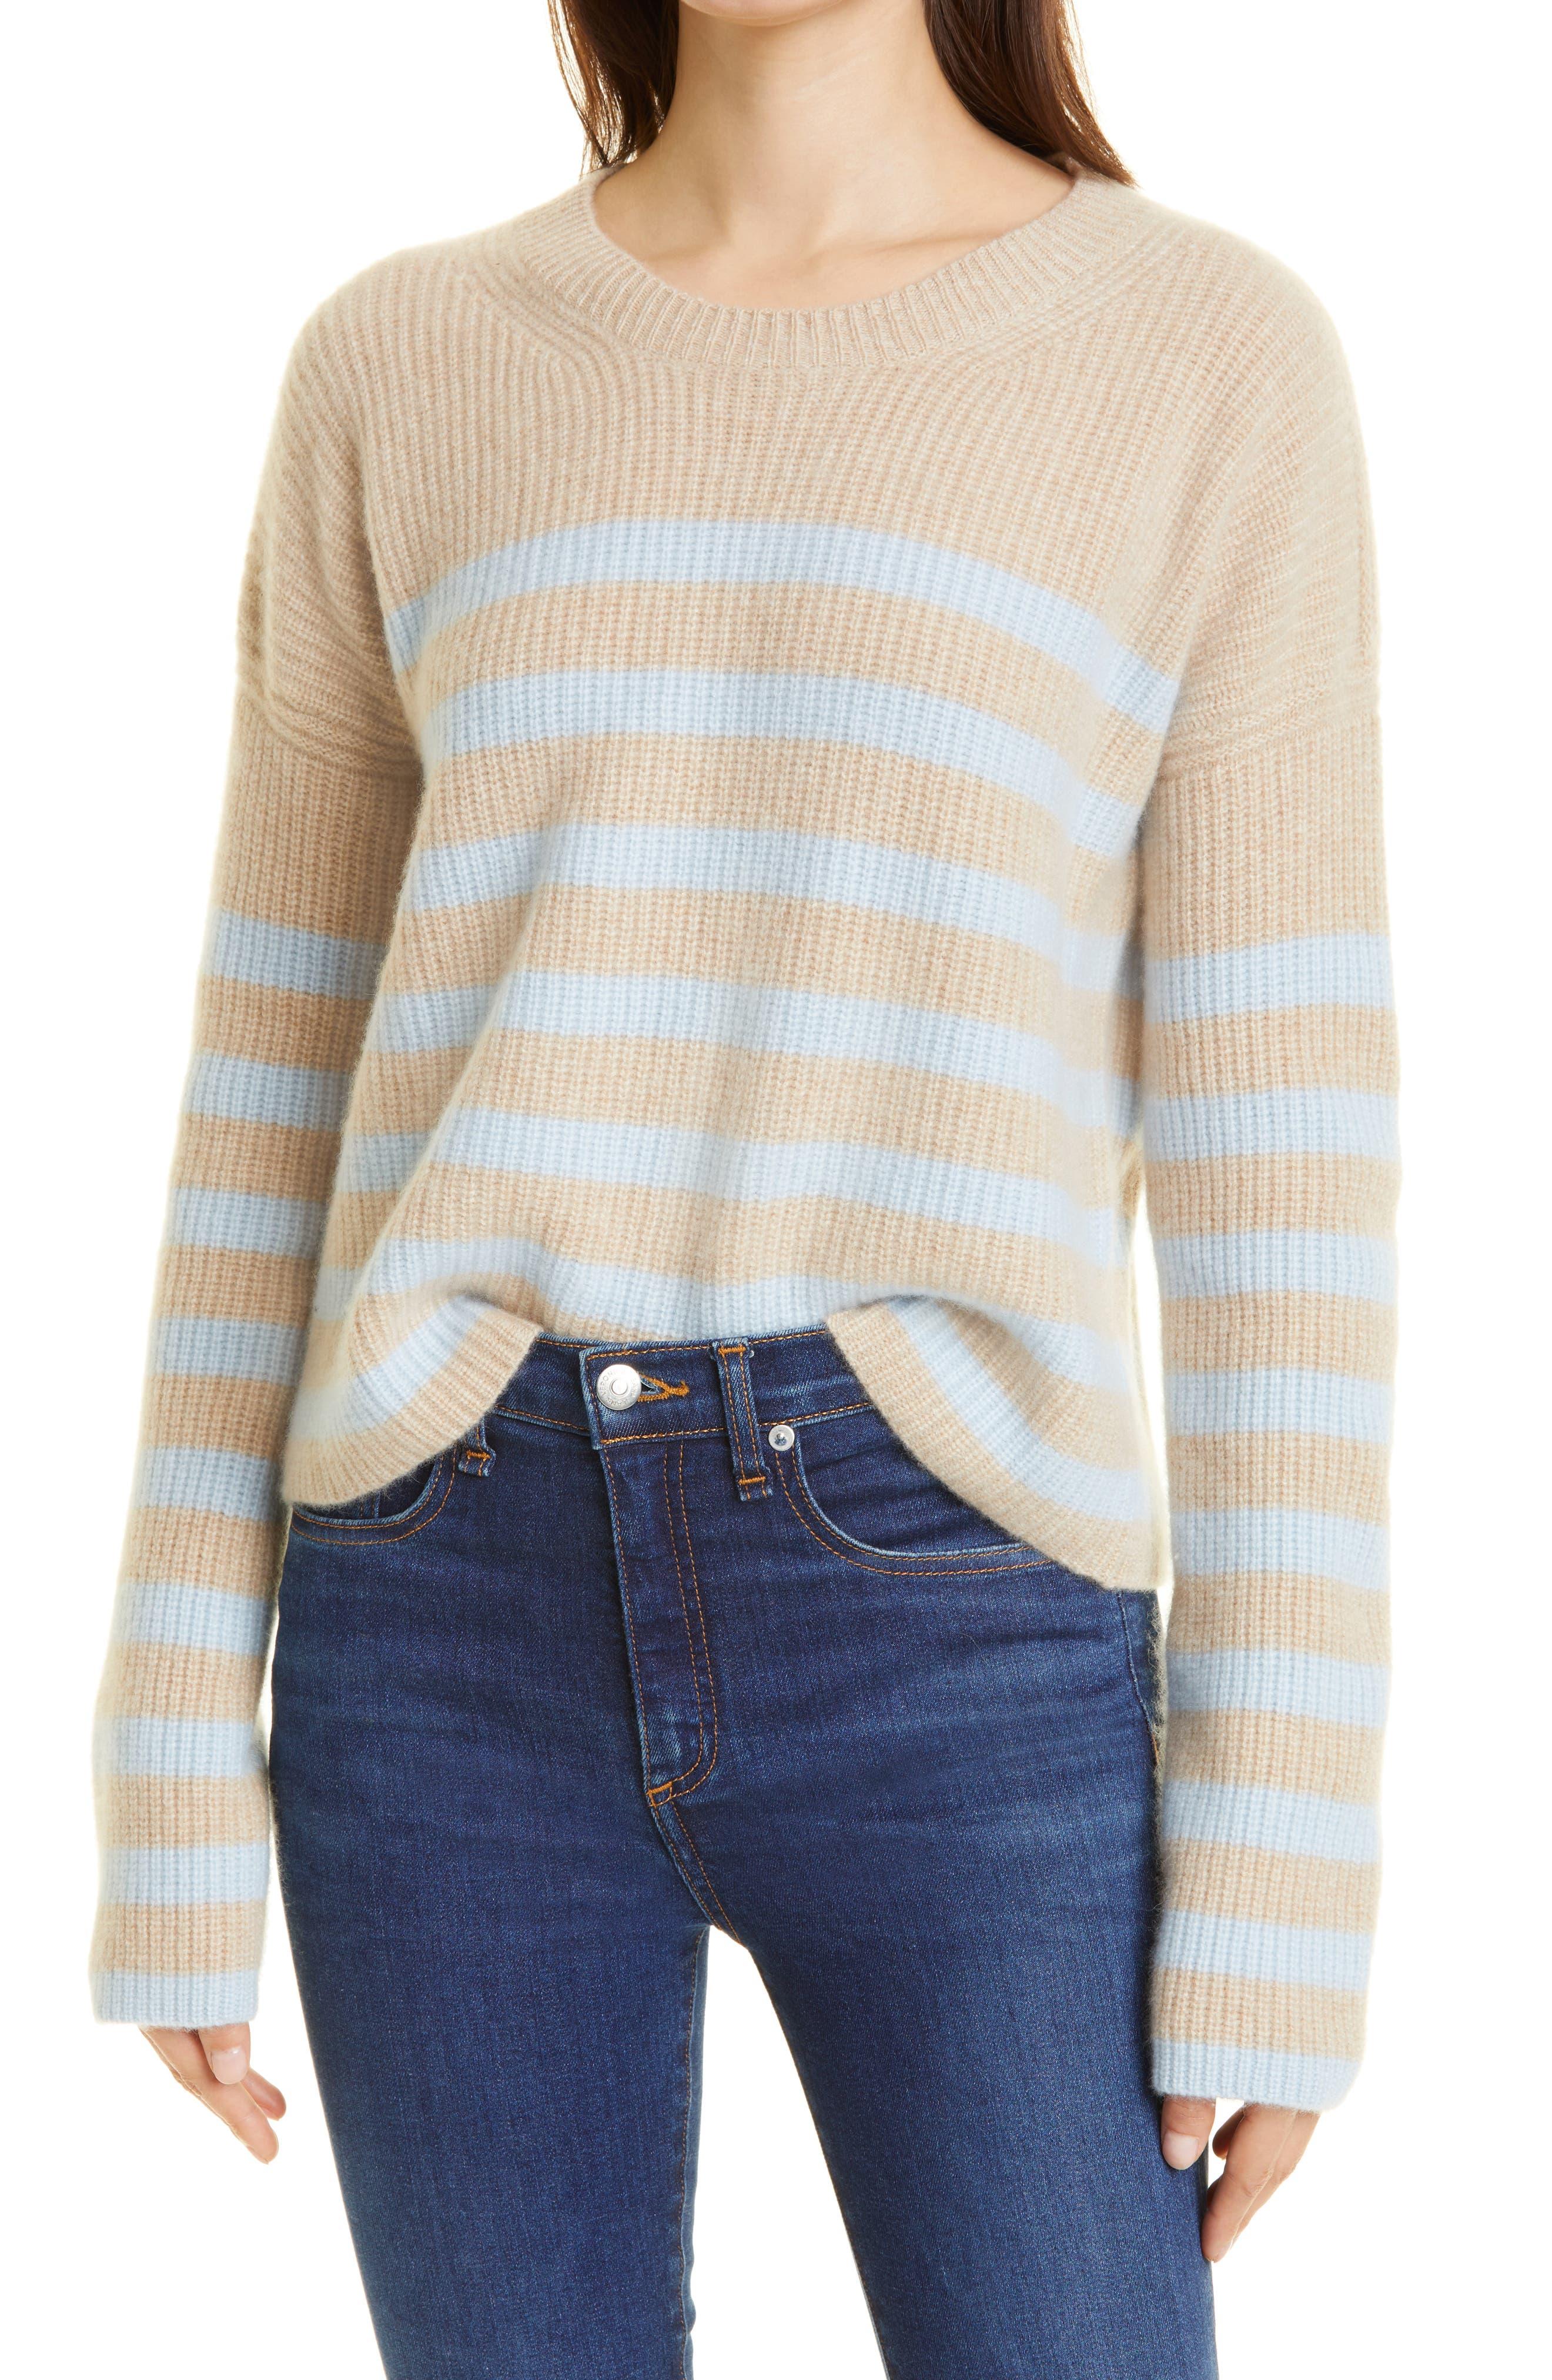 Toujours Stripe Cashmere Sweater